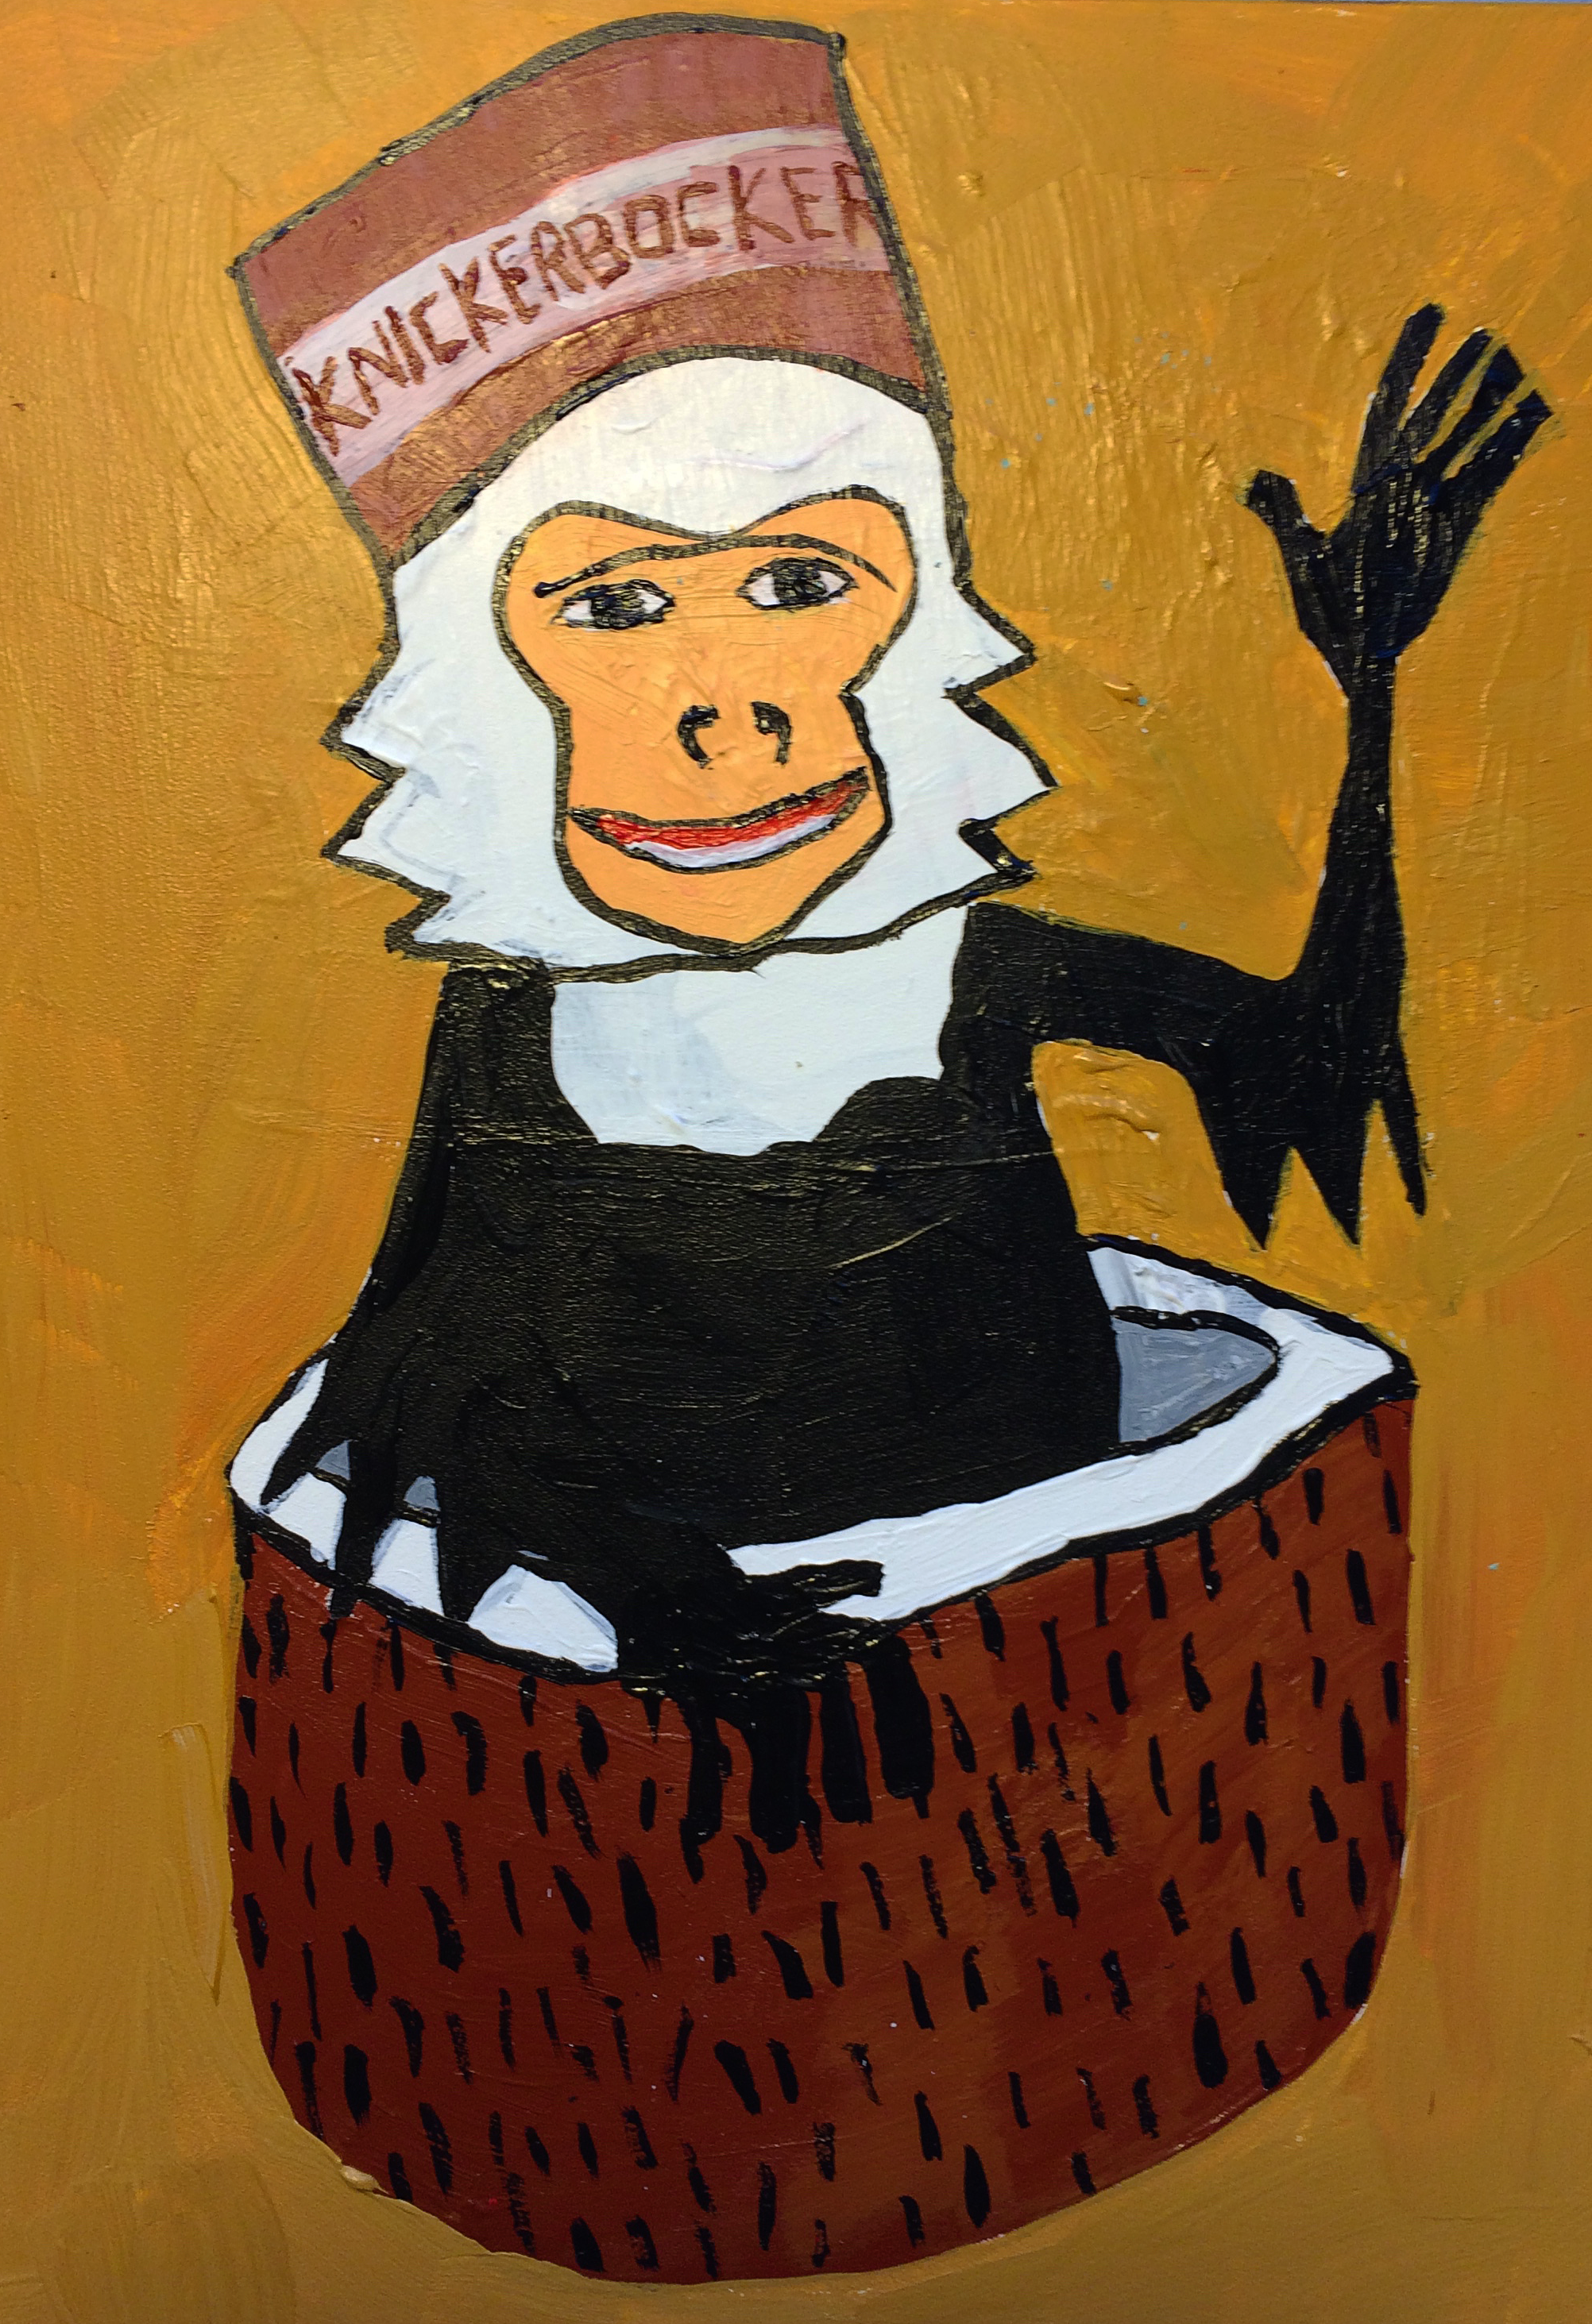 Prince Charles the Monkey